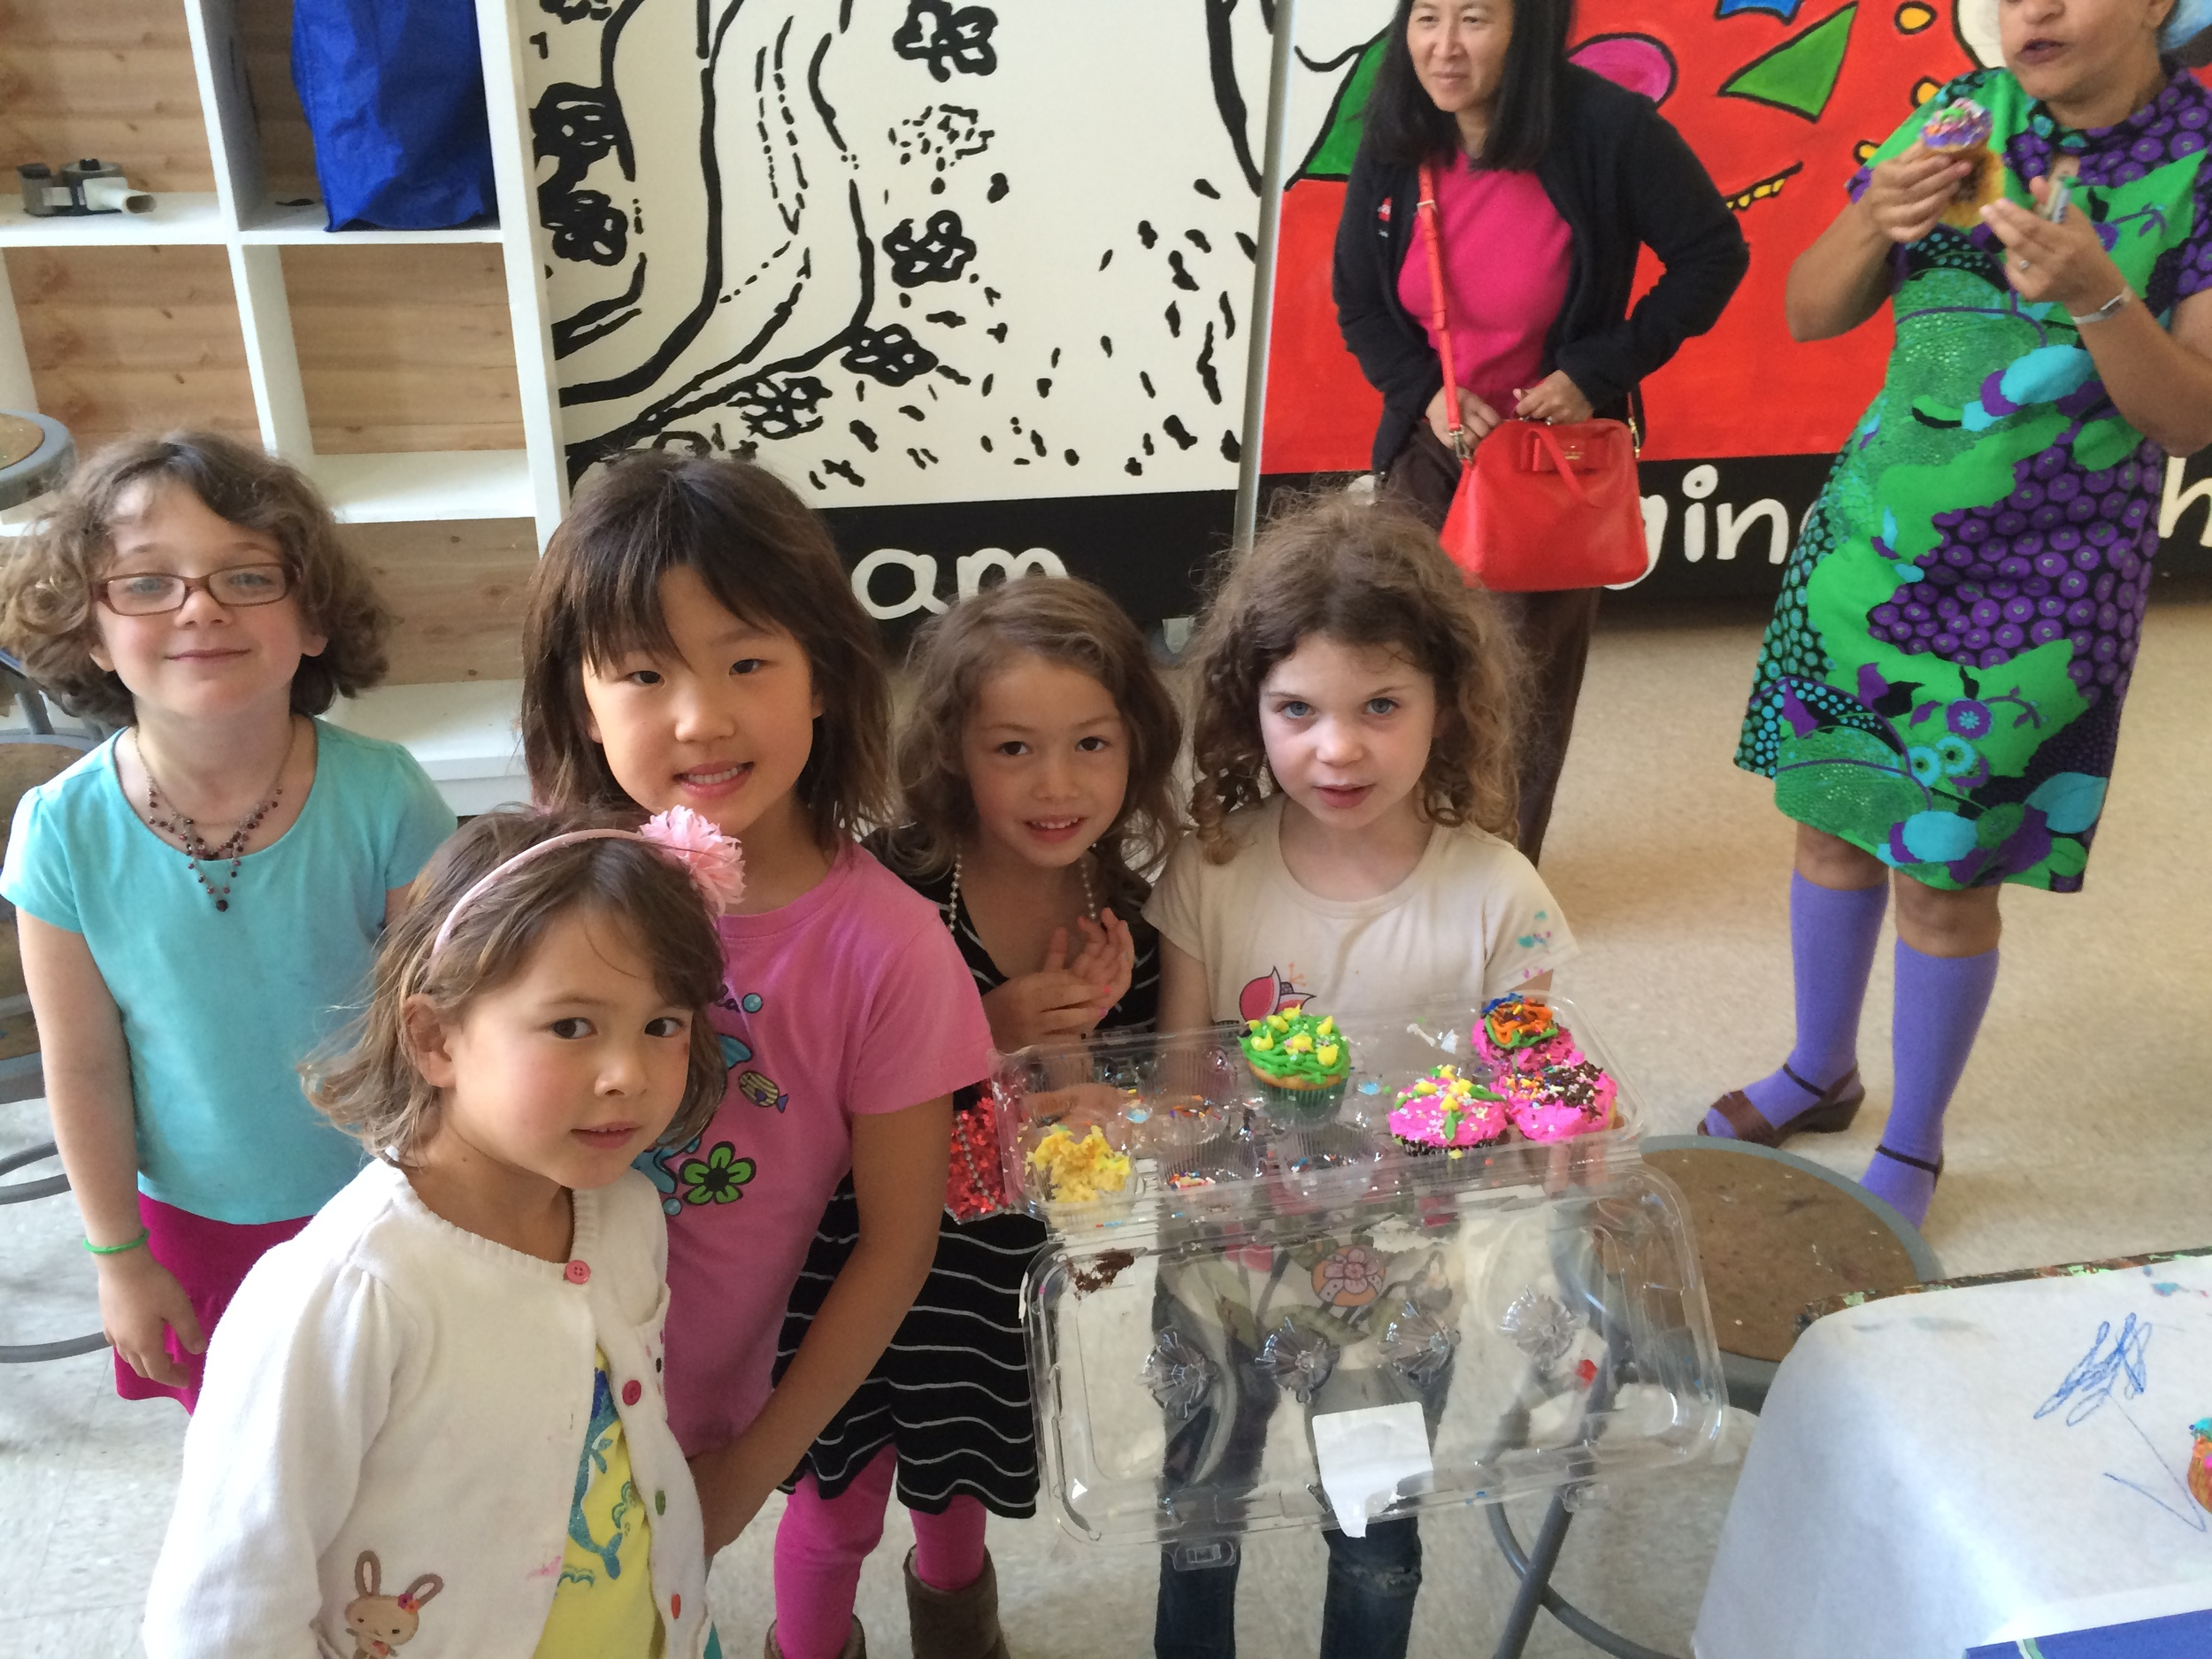 6 kids with cupcakes.jpg